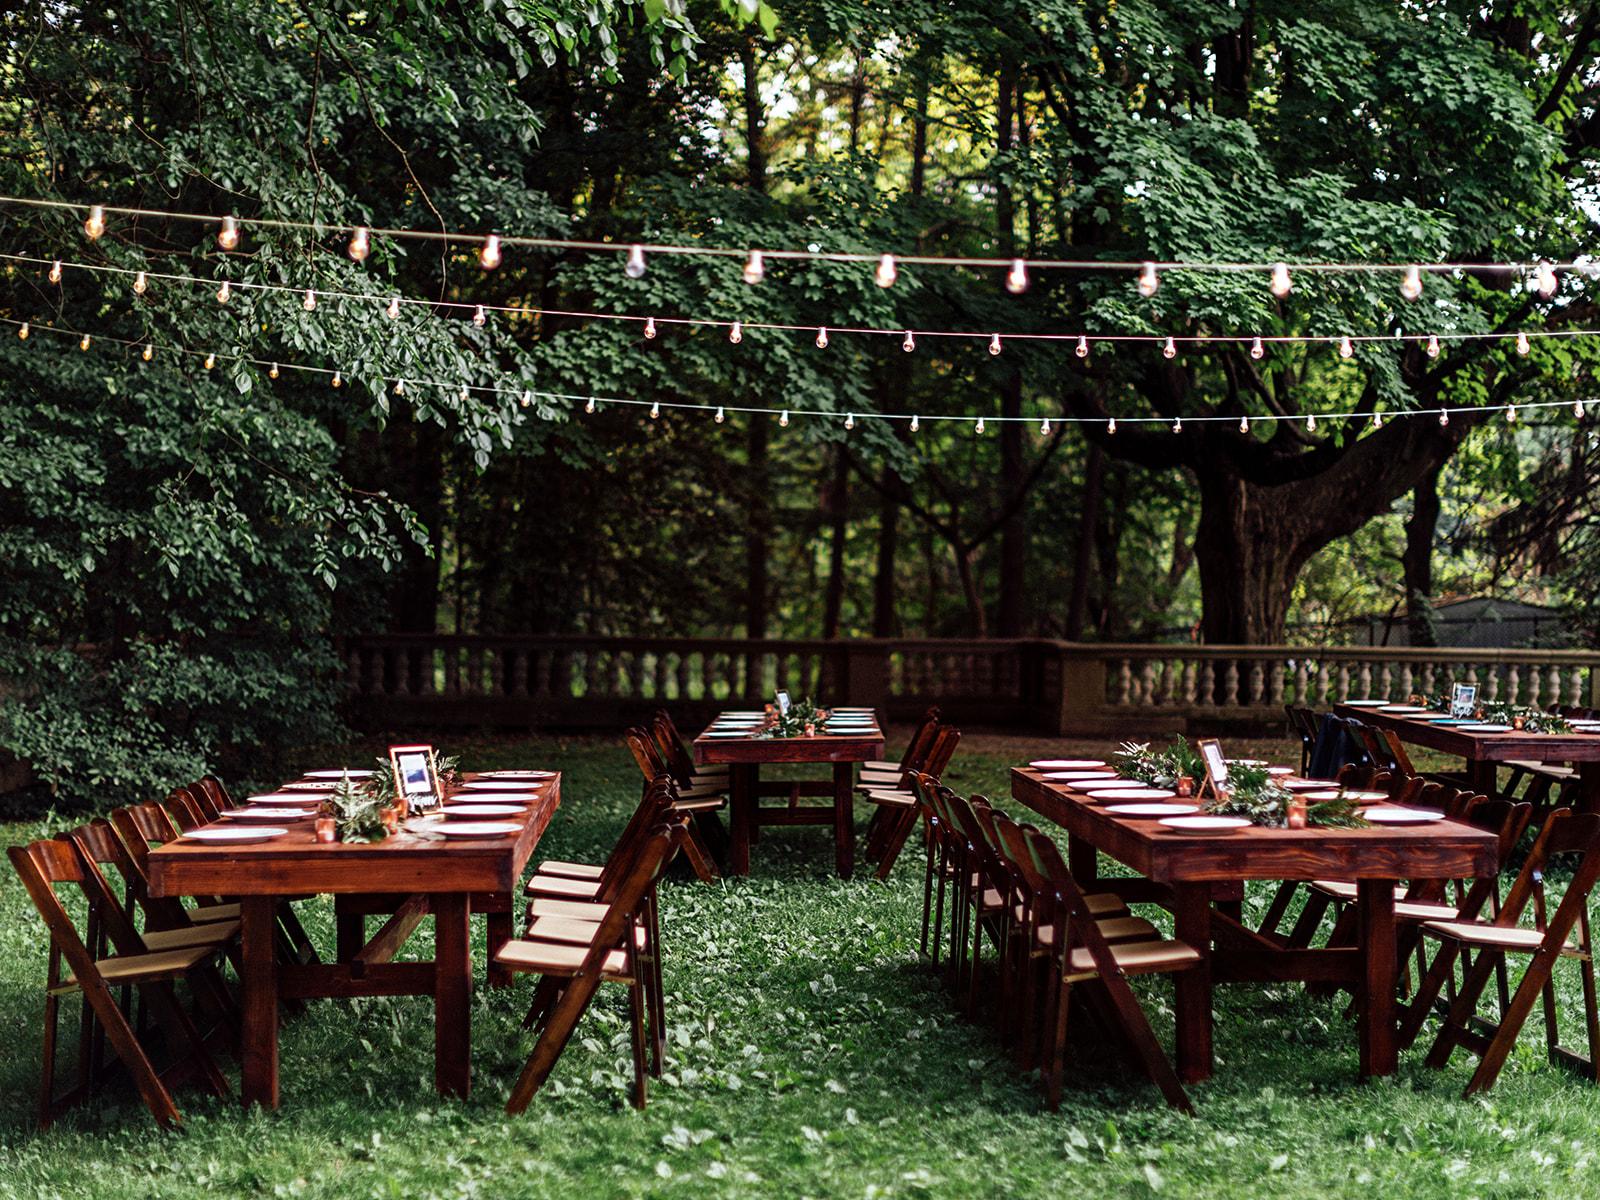 Sensational Farm Style Table Bench Rentals In Lancaster Pa De Md Short Links Chair Design For Home Short Linksinfo